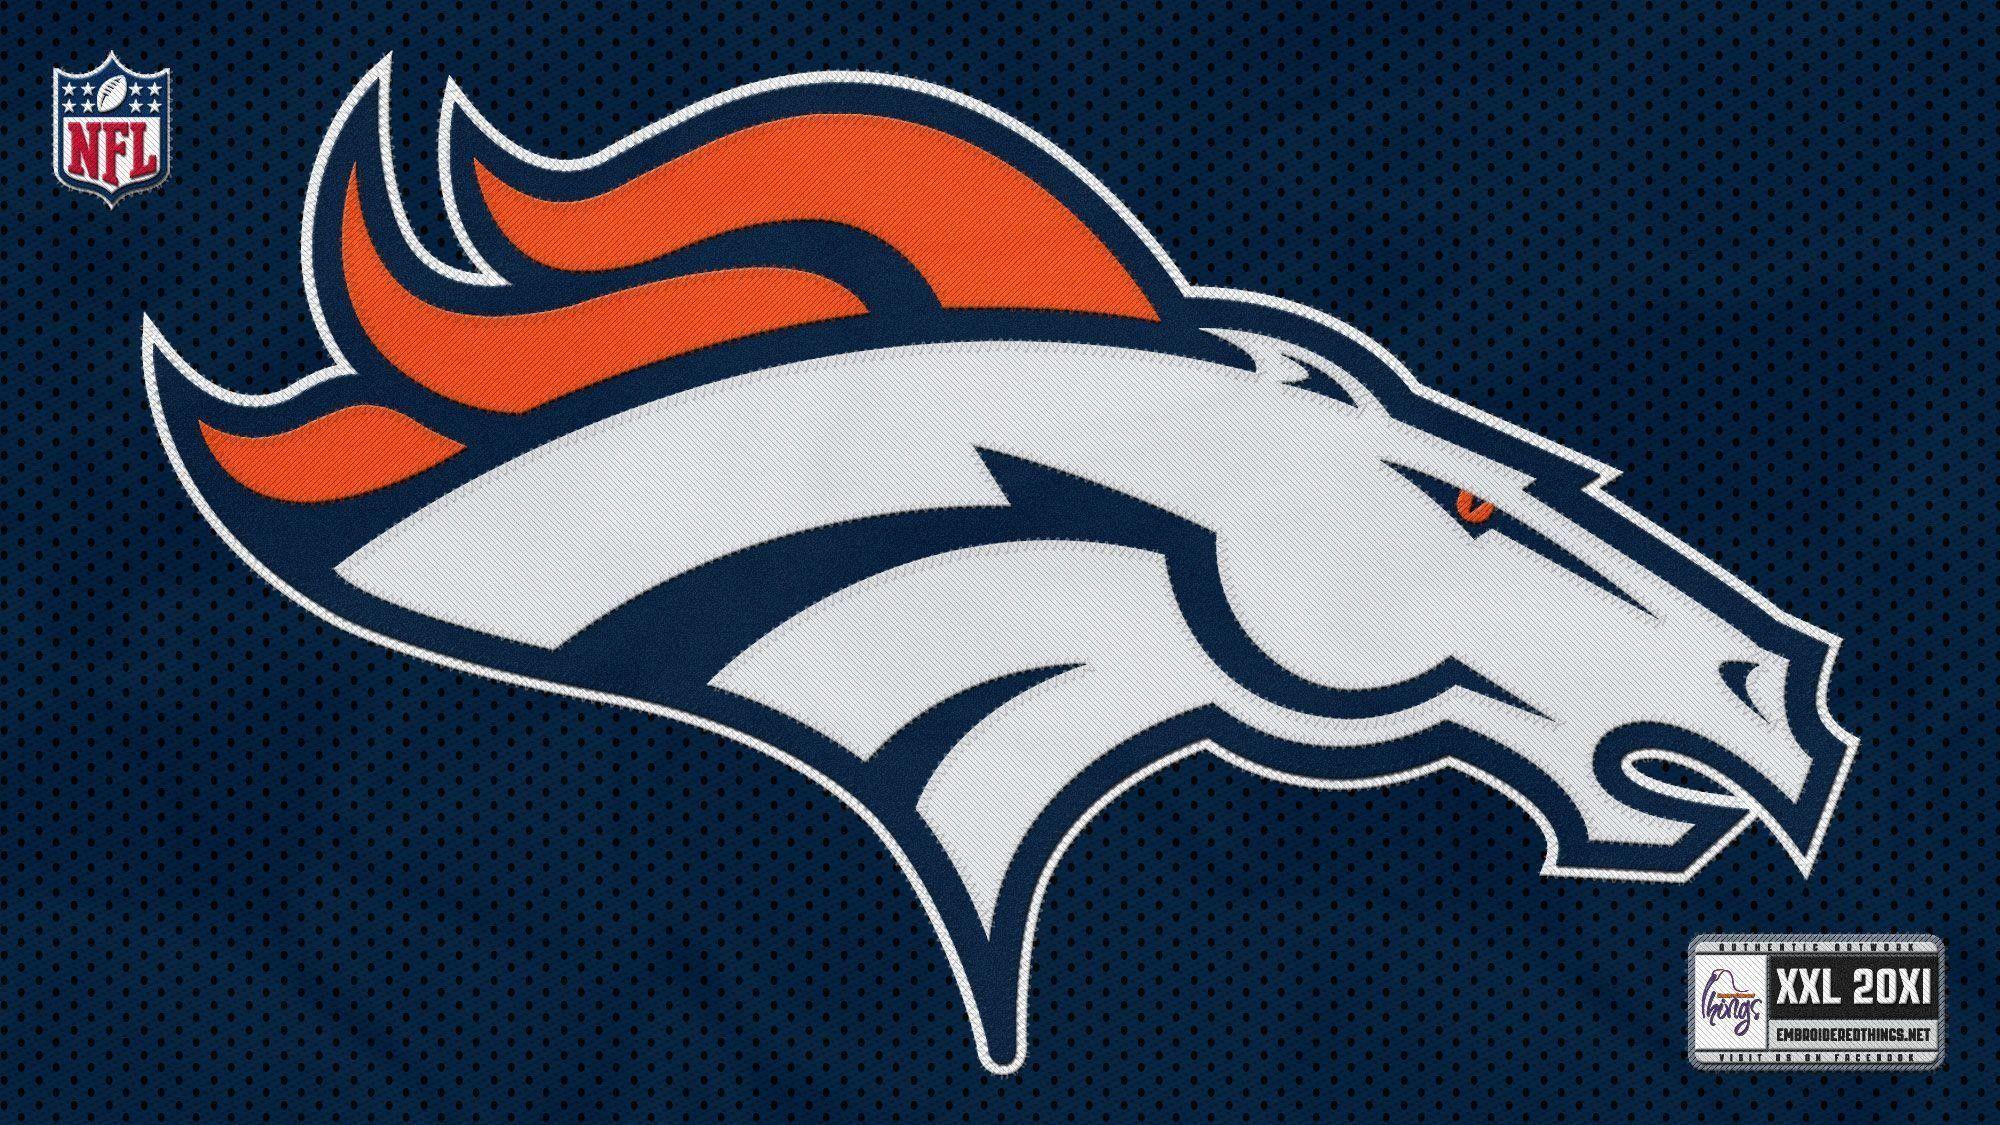 Denver Broncos Wallpaper di 2020